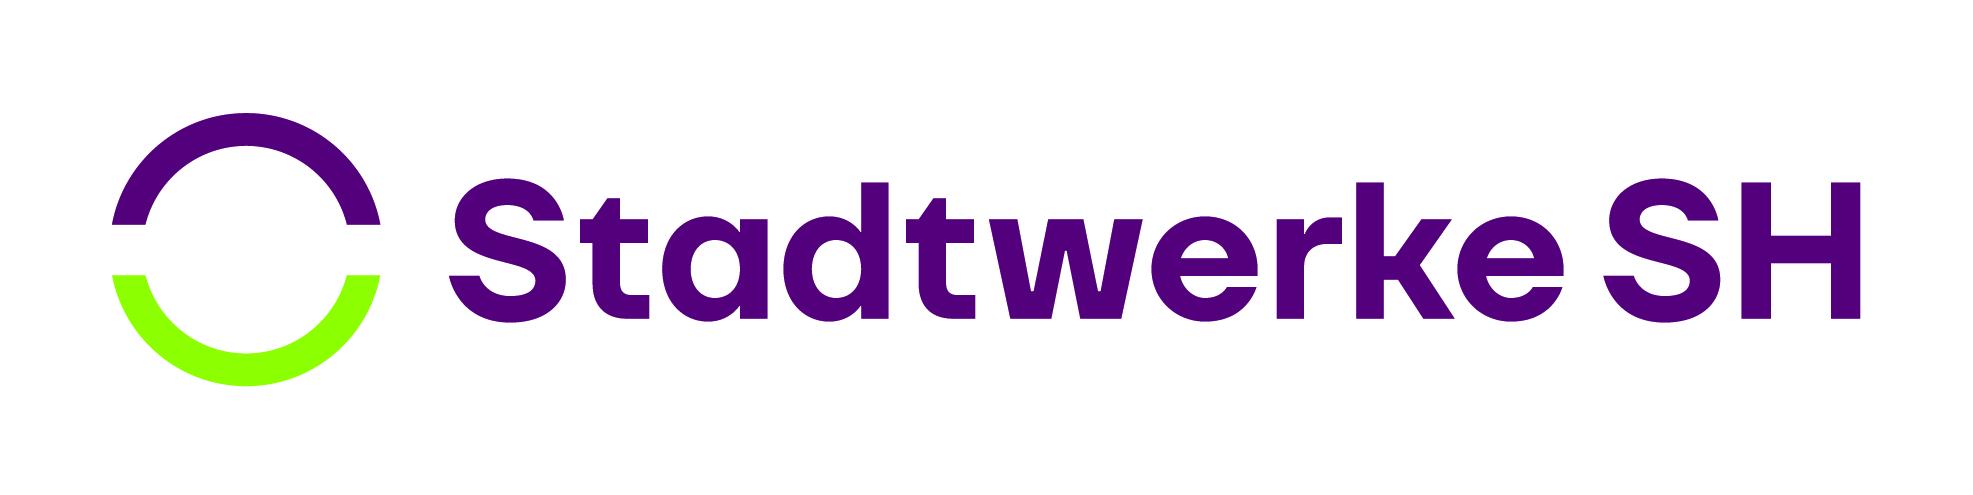 Logo Stadtwerke SH GmbH & Co. KG